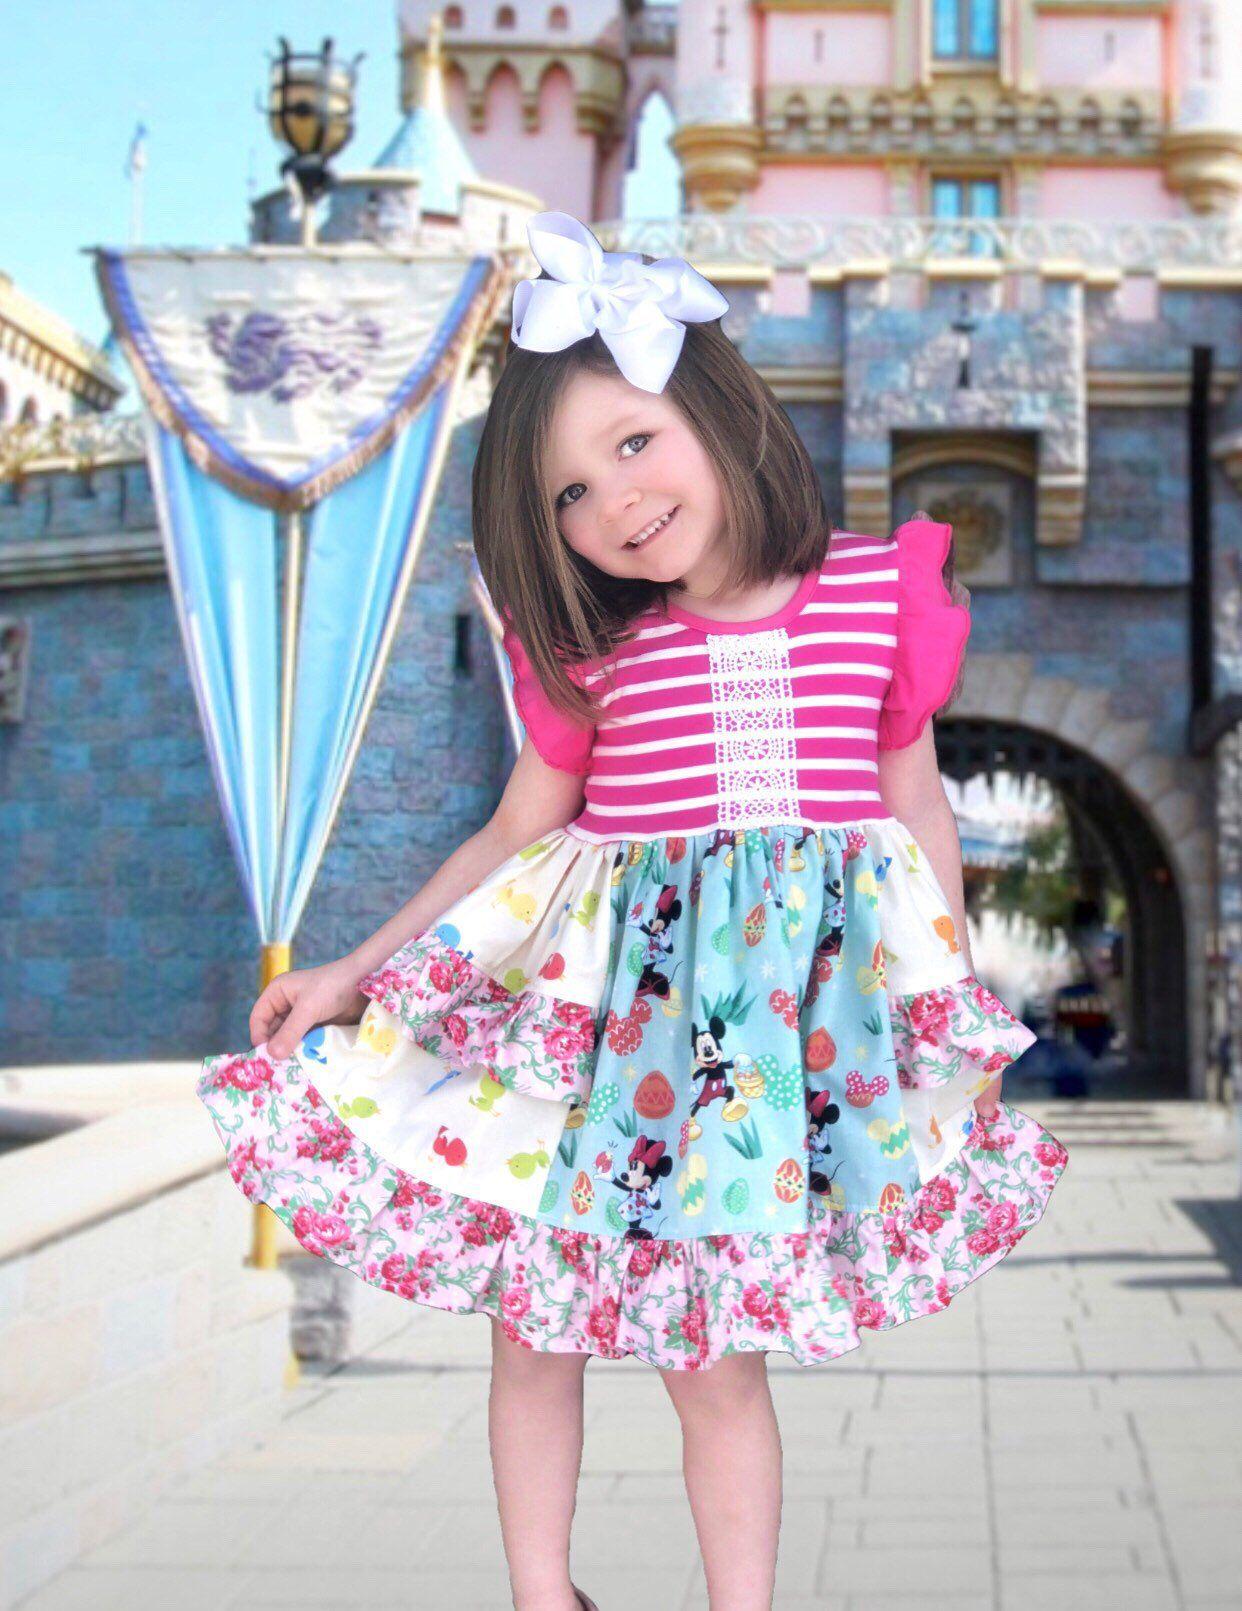 Disney easter dress, girls Easter dresses, Disney outfit